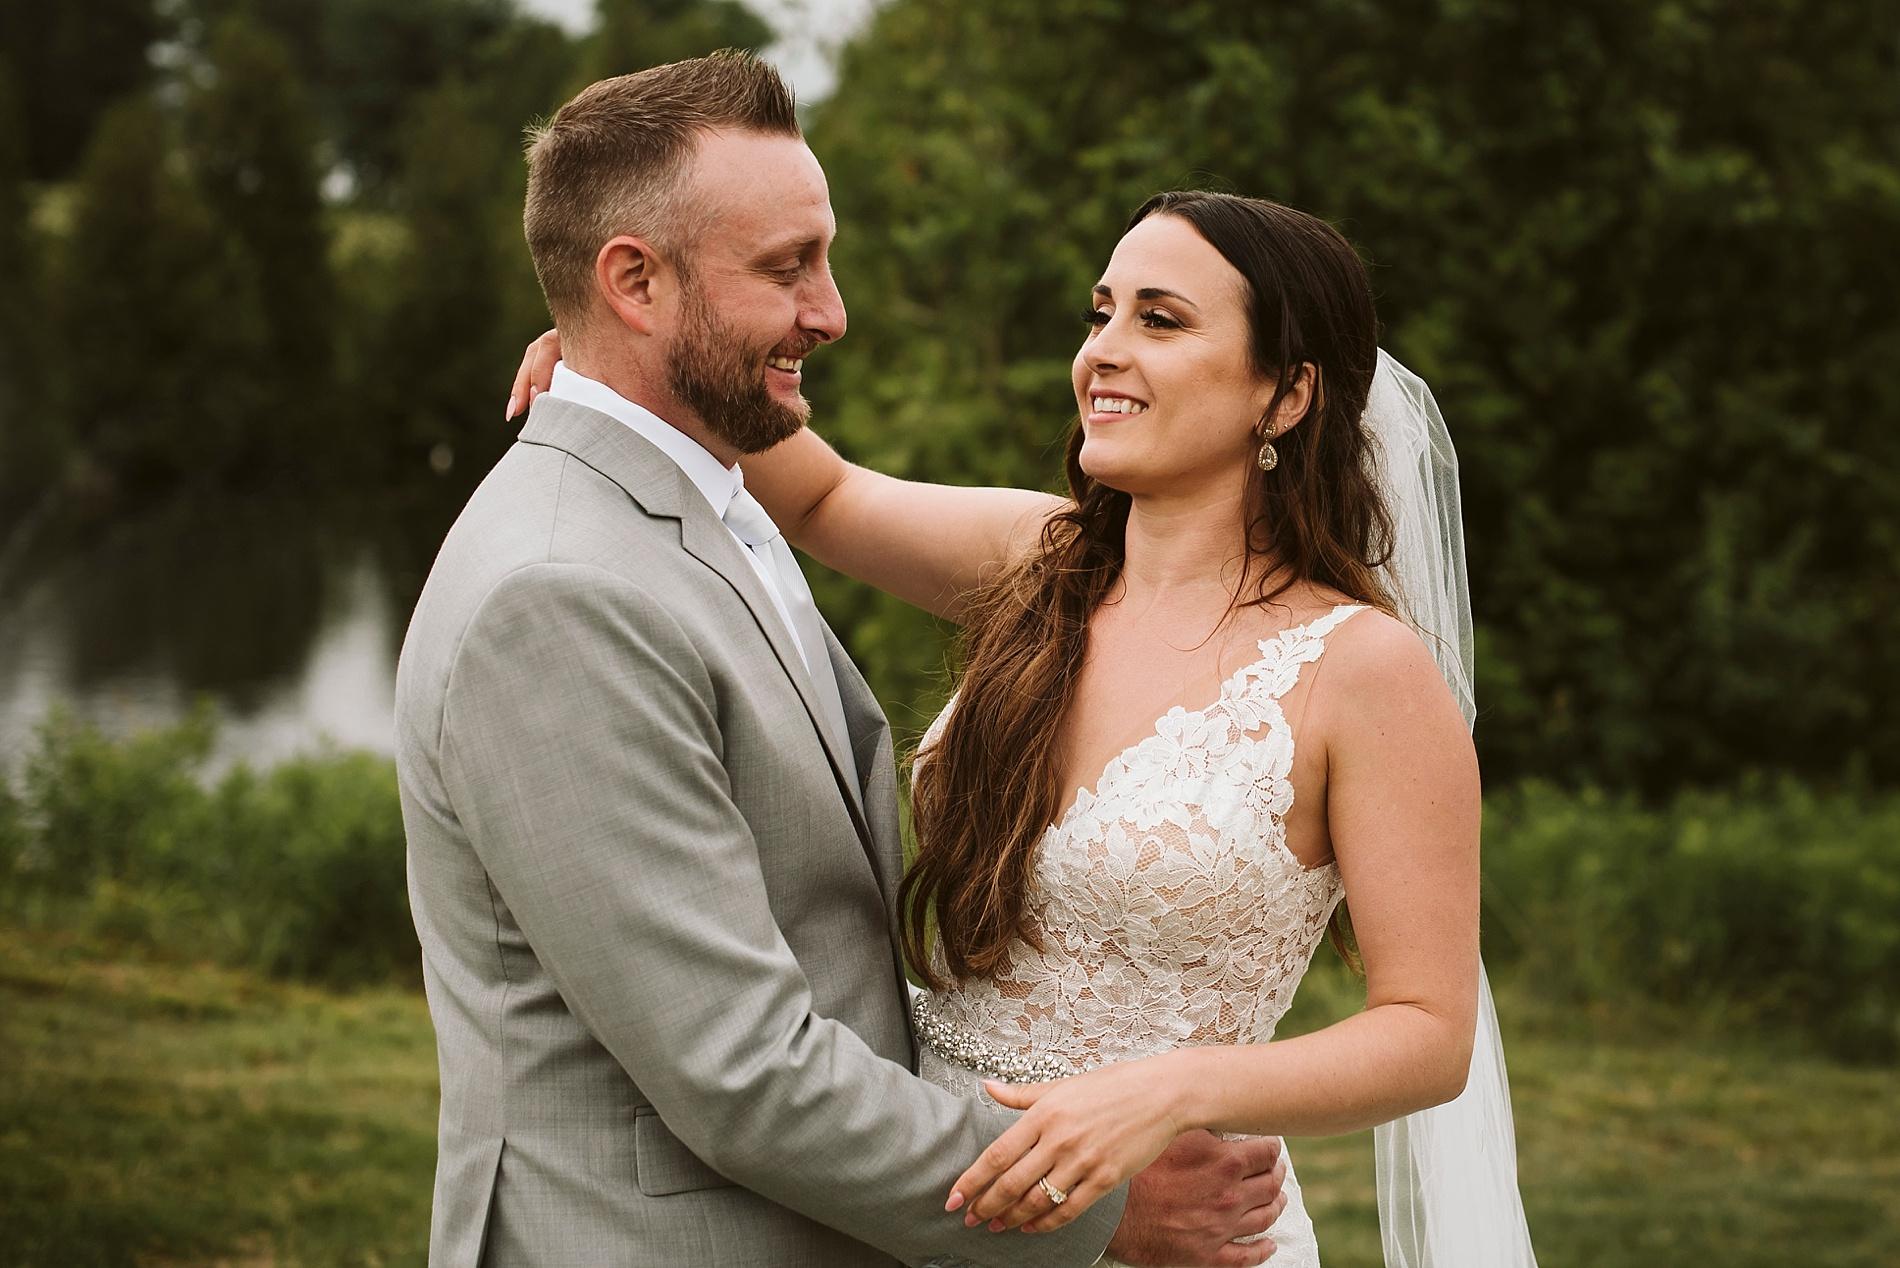 Kawartha_Lakes_Wedding_Bobcageon_Eganridge_Resort_Toronto_Photographer_0051.jpg